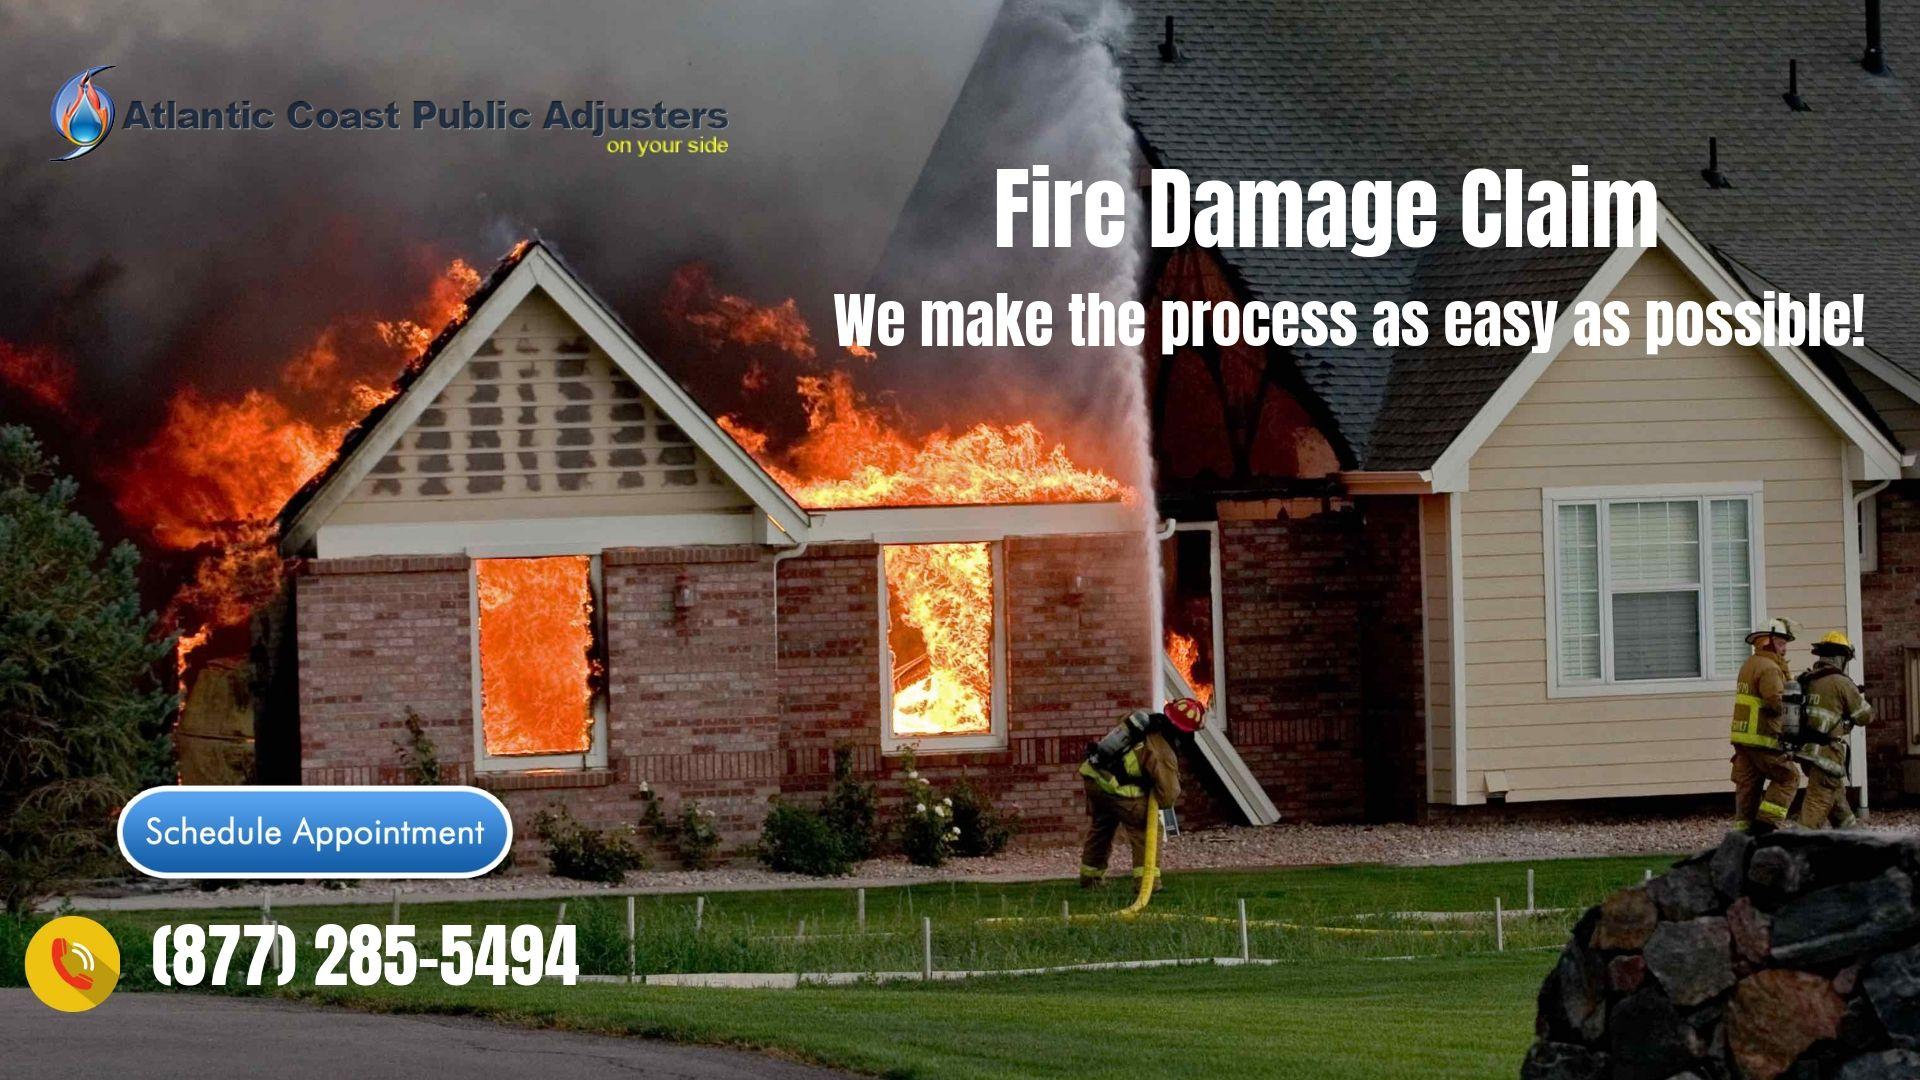 Fire damage miami fire damage smoke damage public